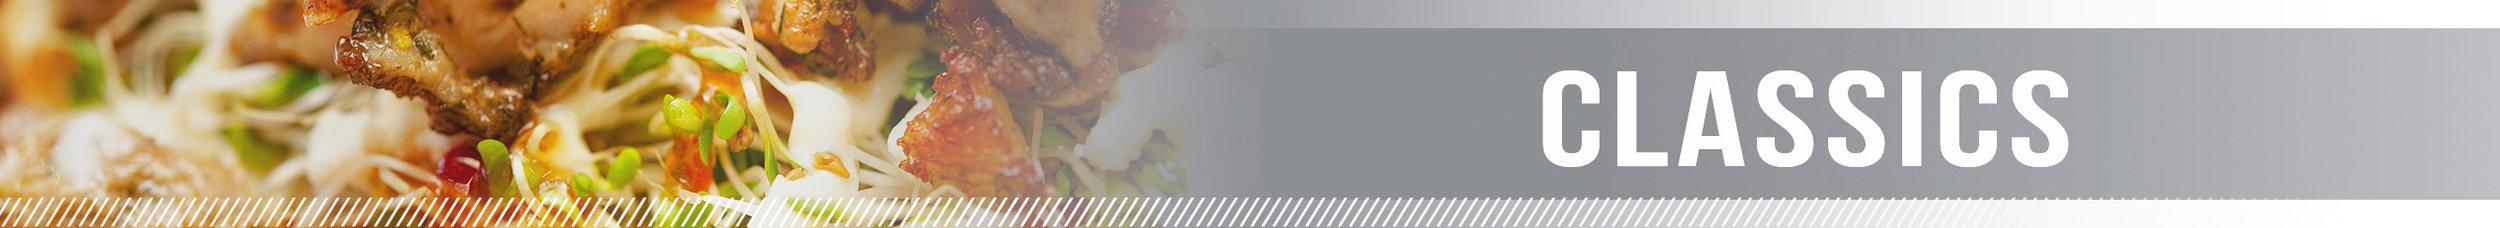 prairie-donair-menu-classic-donairs-shawarma.jpg